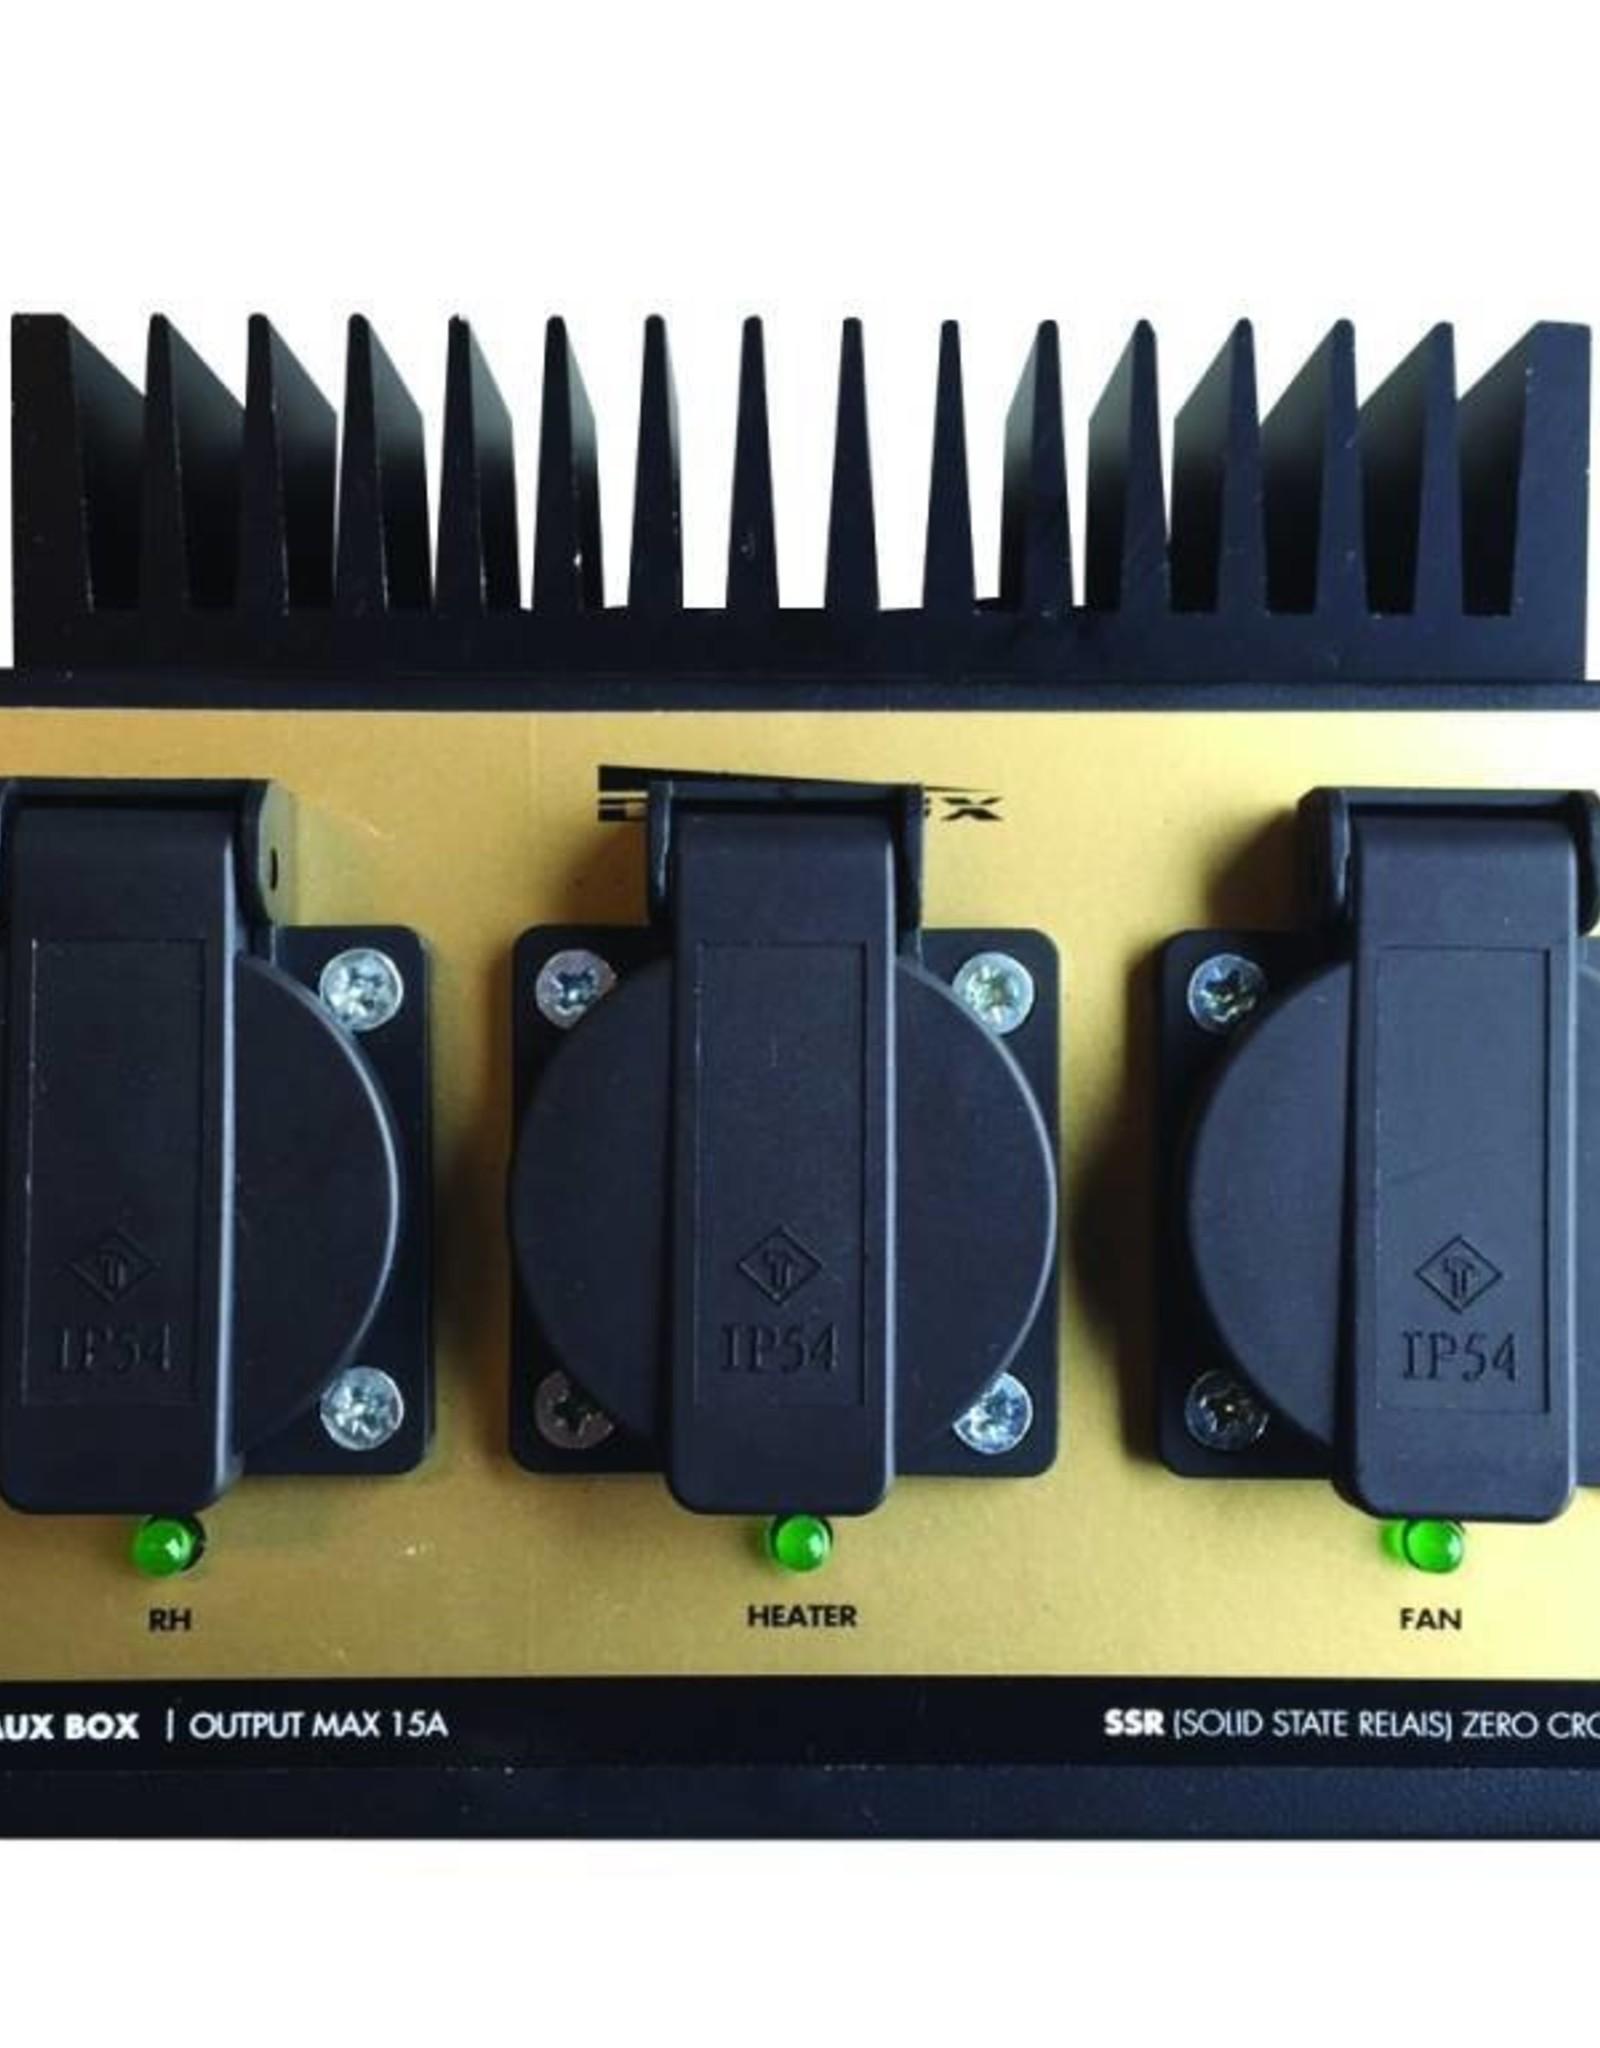 DimLux Fan/Aux box